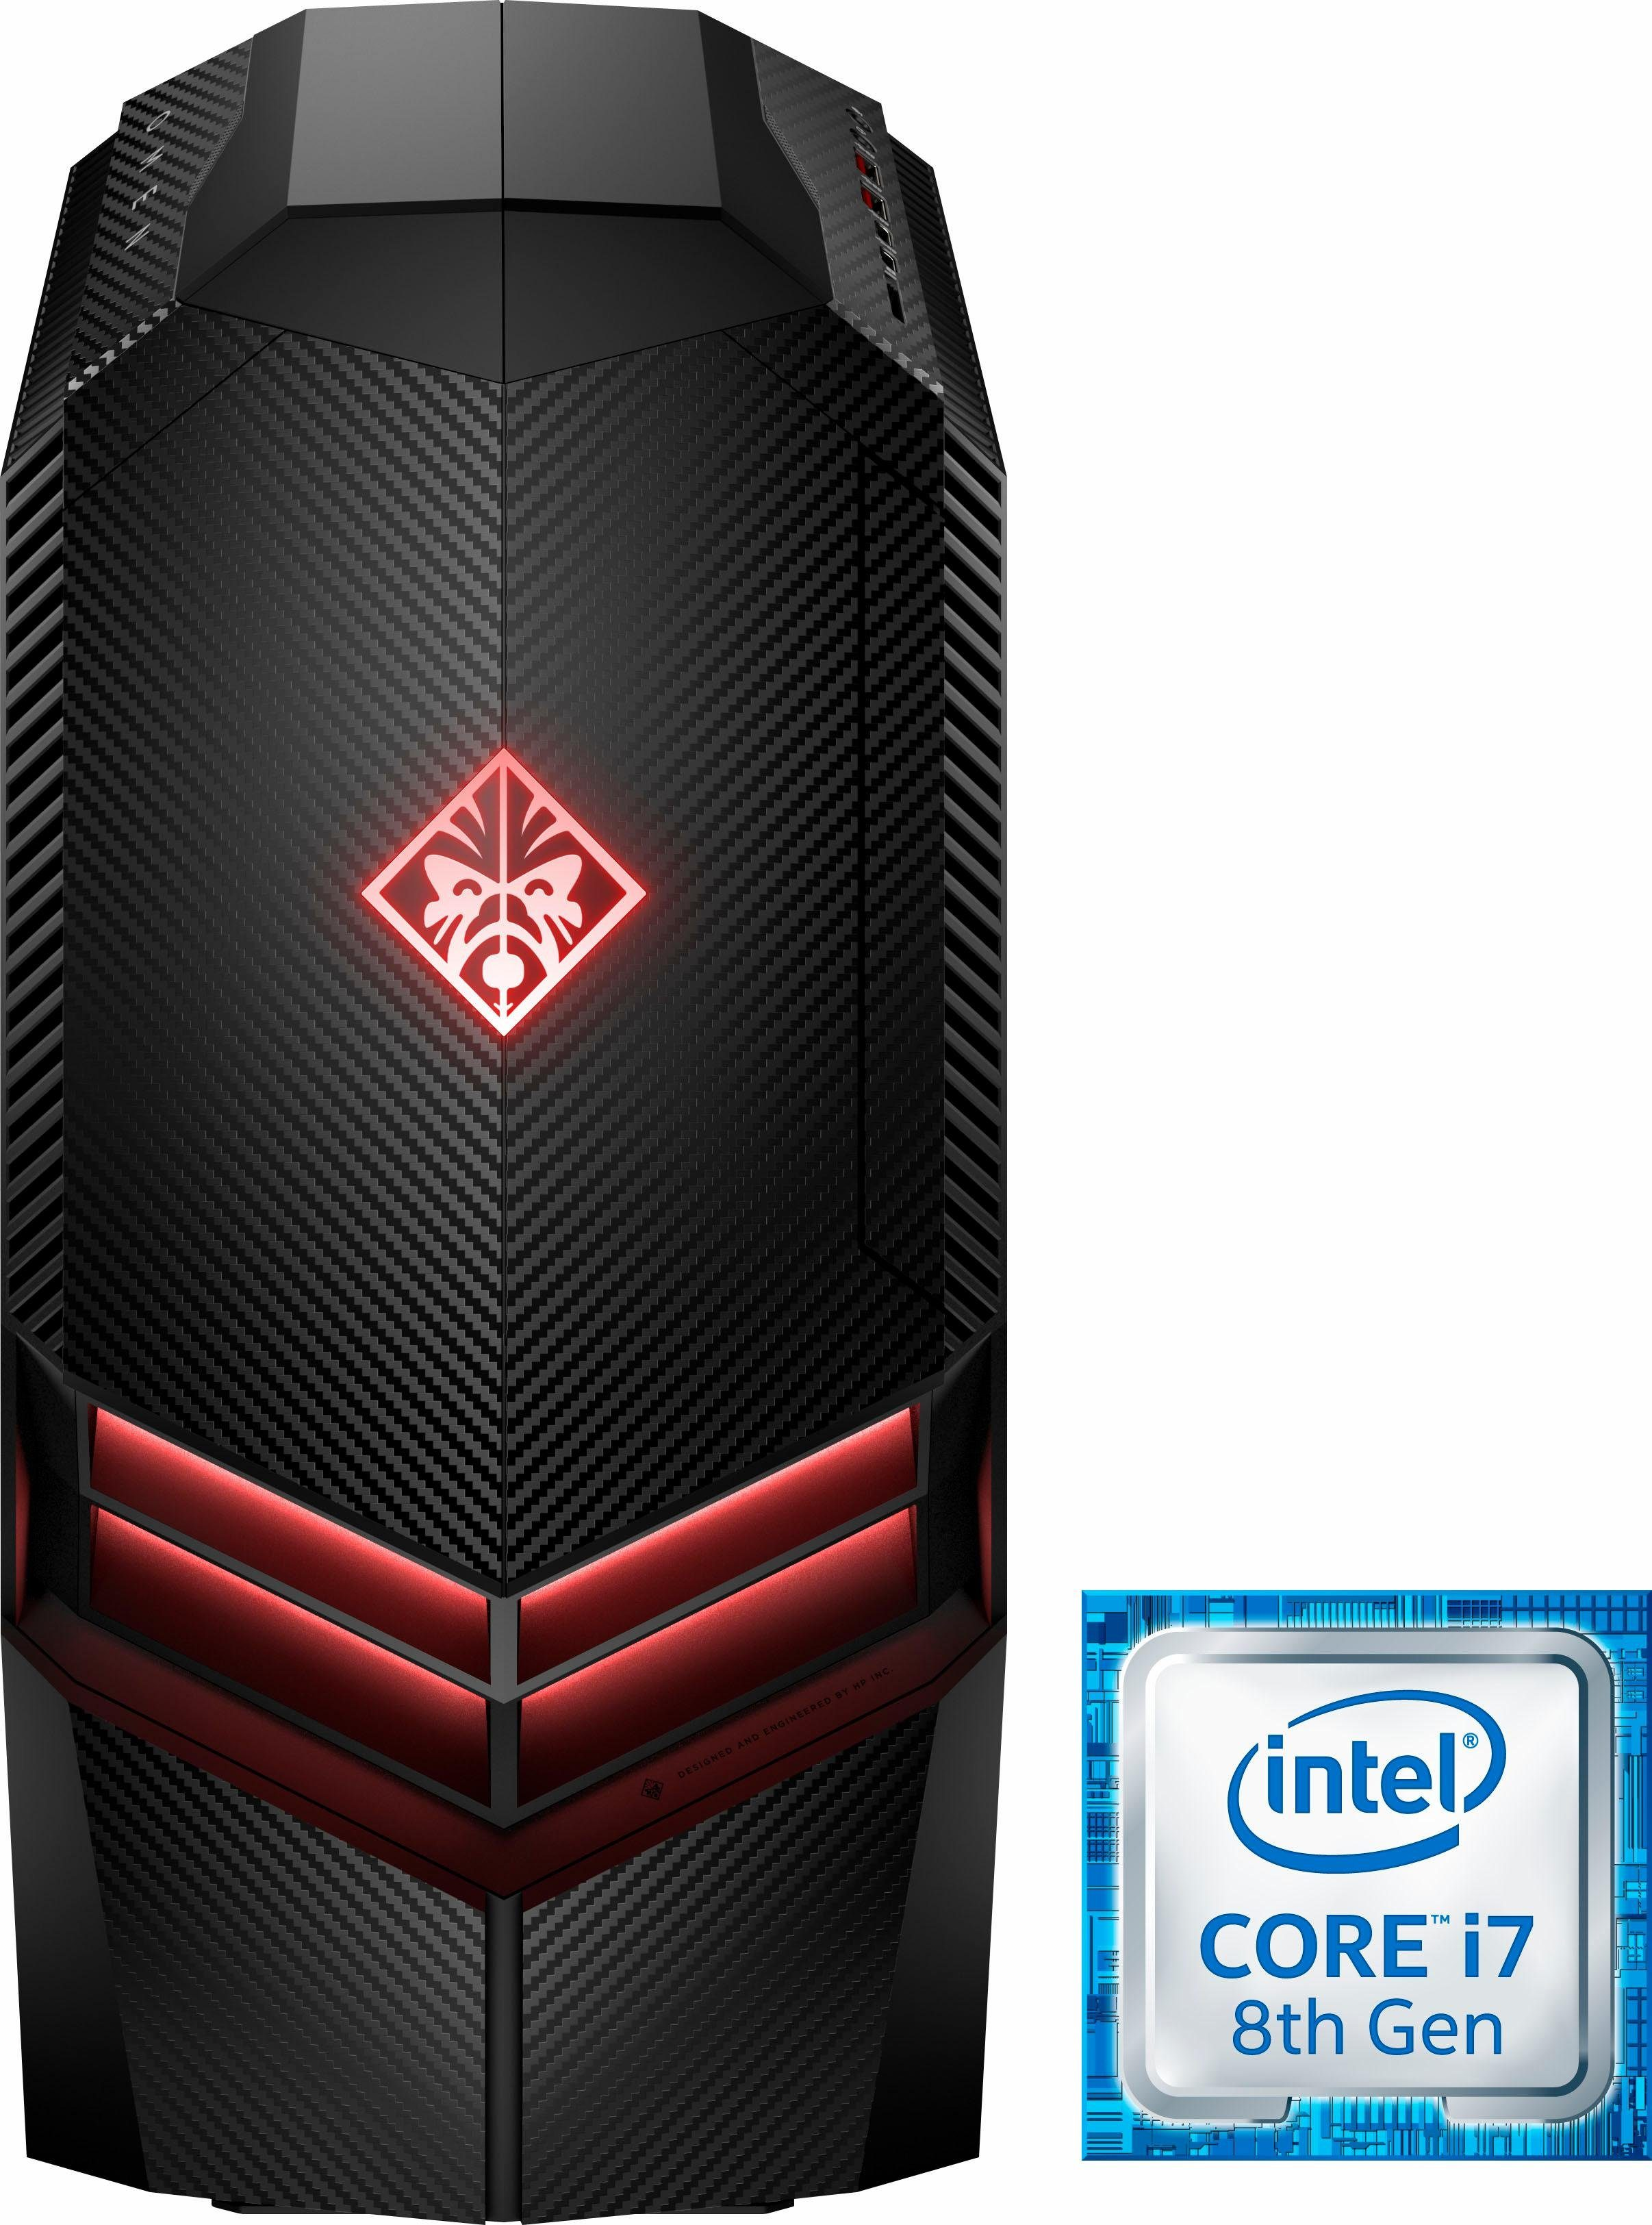 OMEN by HP 880-162ng Gaming-PC (Intel® Core i7, GTX 1080, 32 GB RAM, 3000 GB HDD, 512 GB SSD, Wasserkühlung)